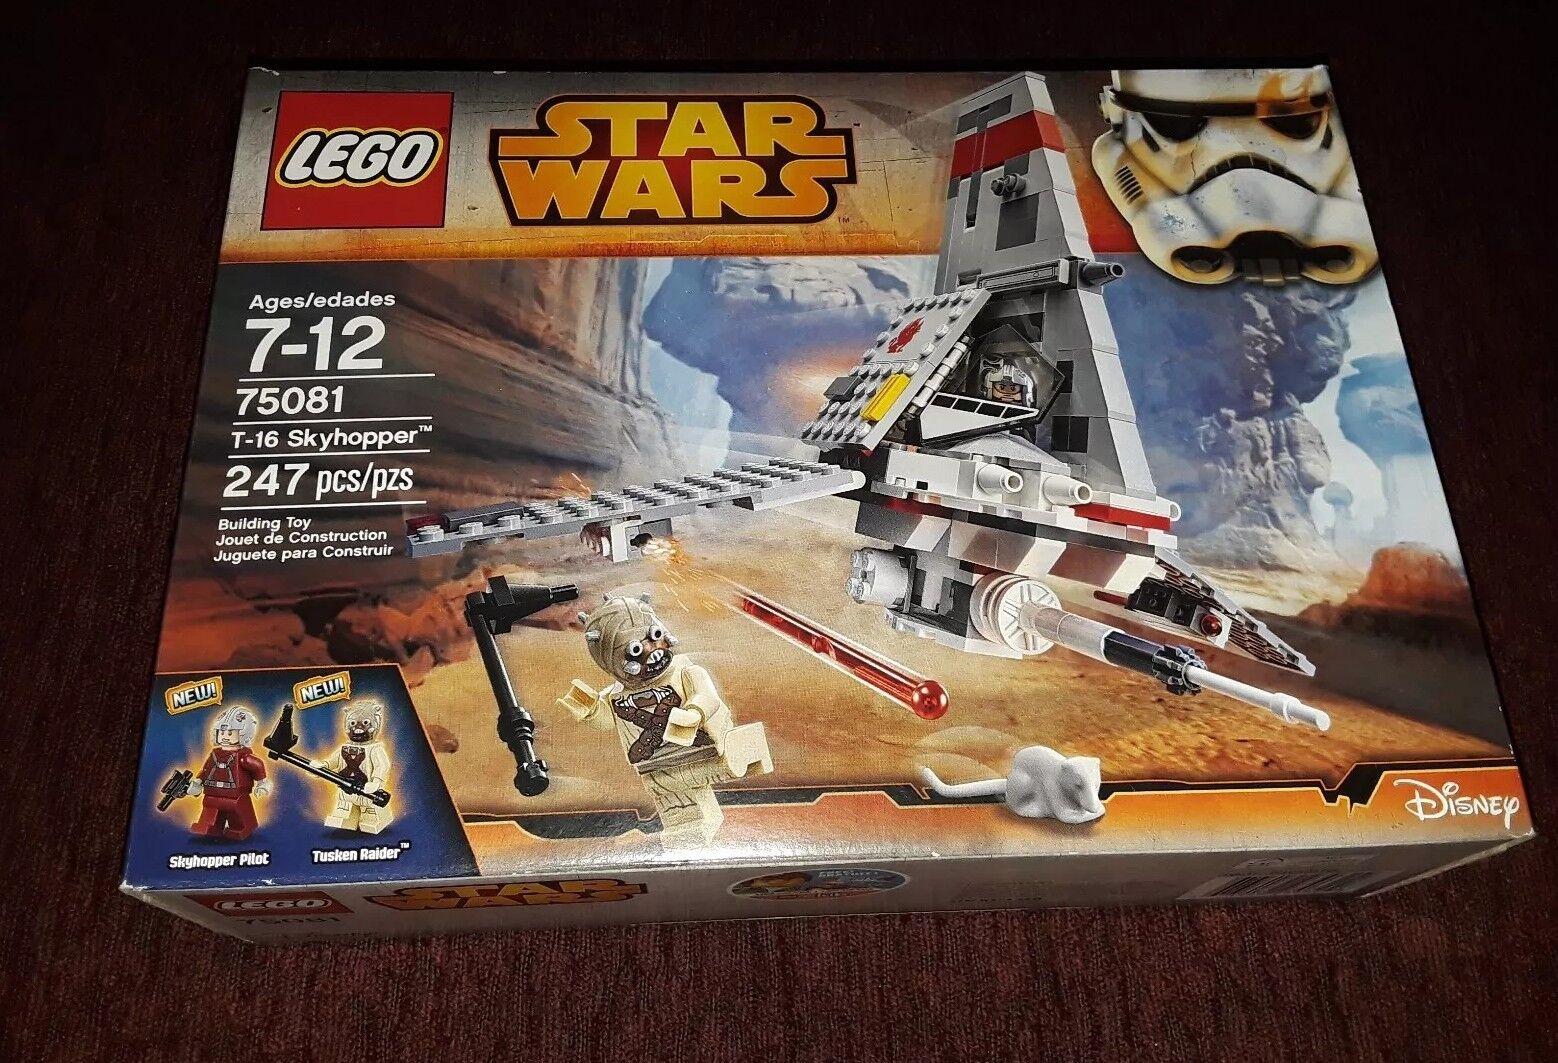 Lego Star Wars Set # 75081 T-16 Skyhopper New Sealed